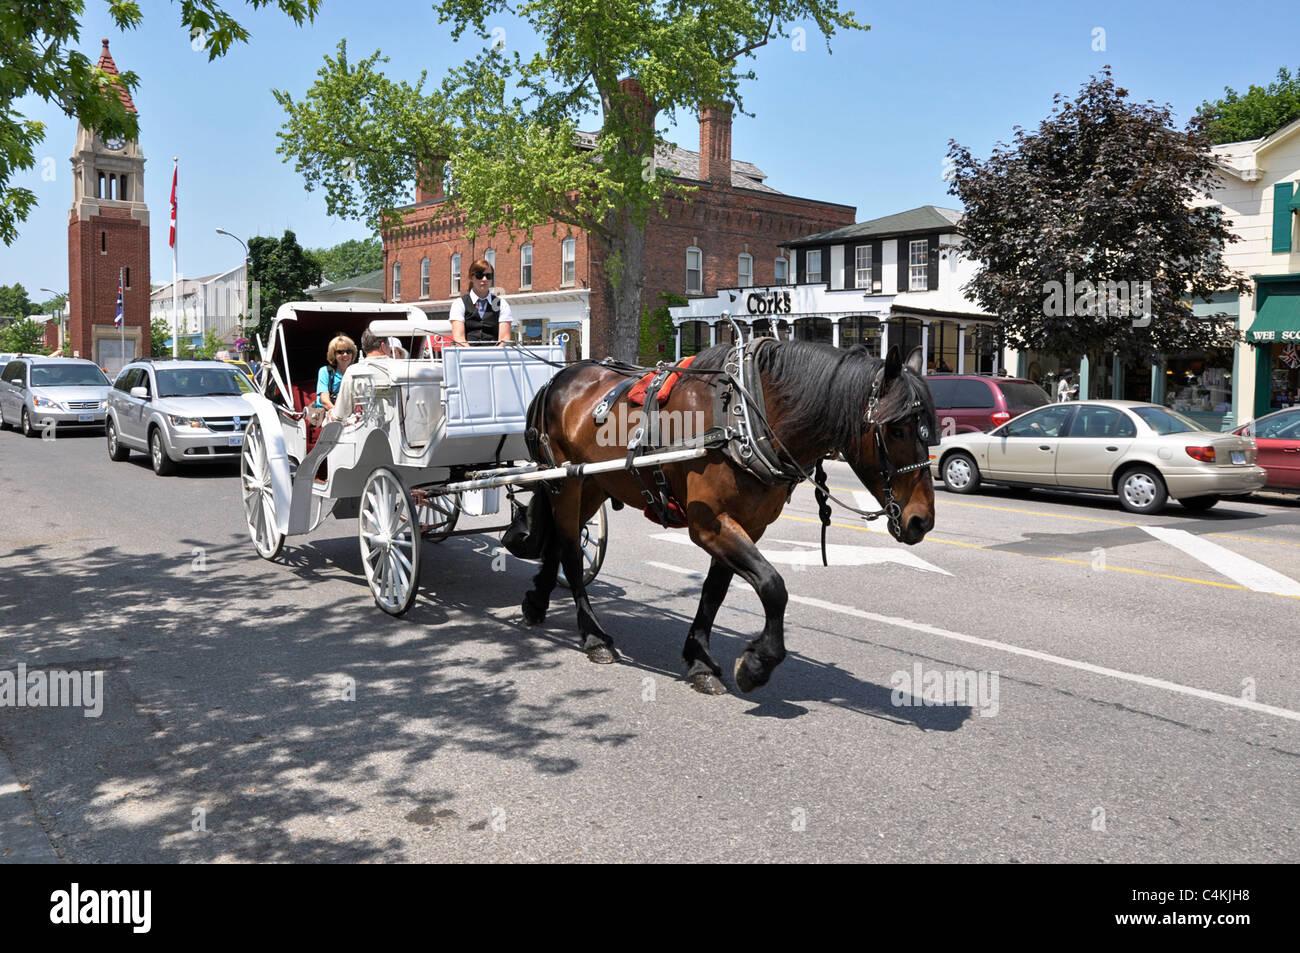 Niagara on the Lake, horse drawn carriage - Stock Image